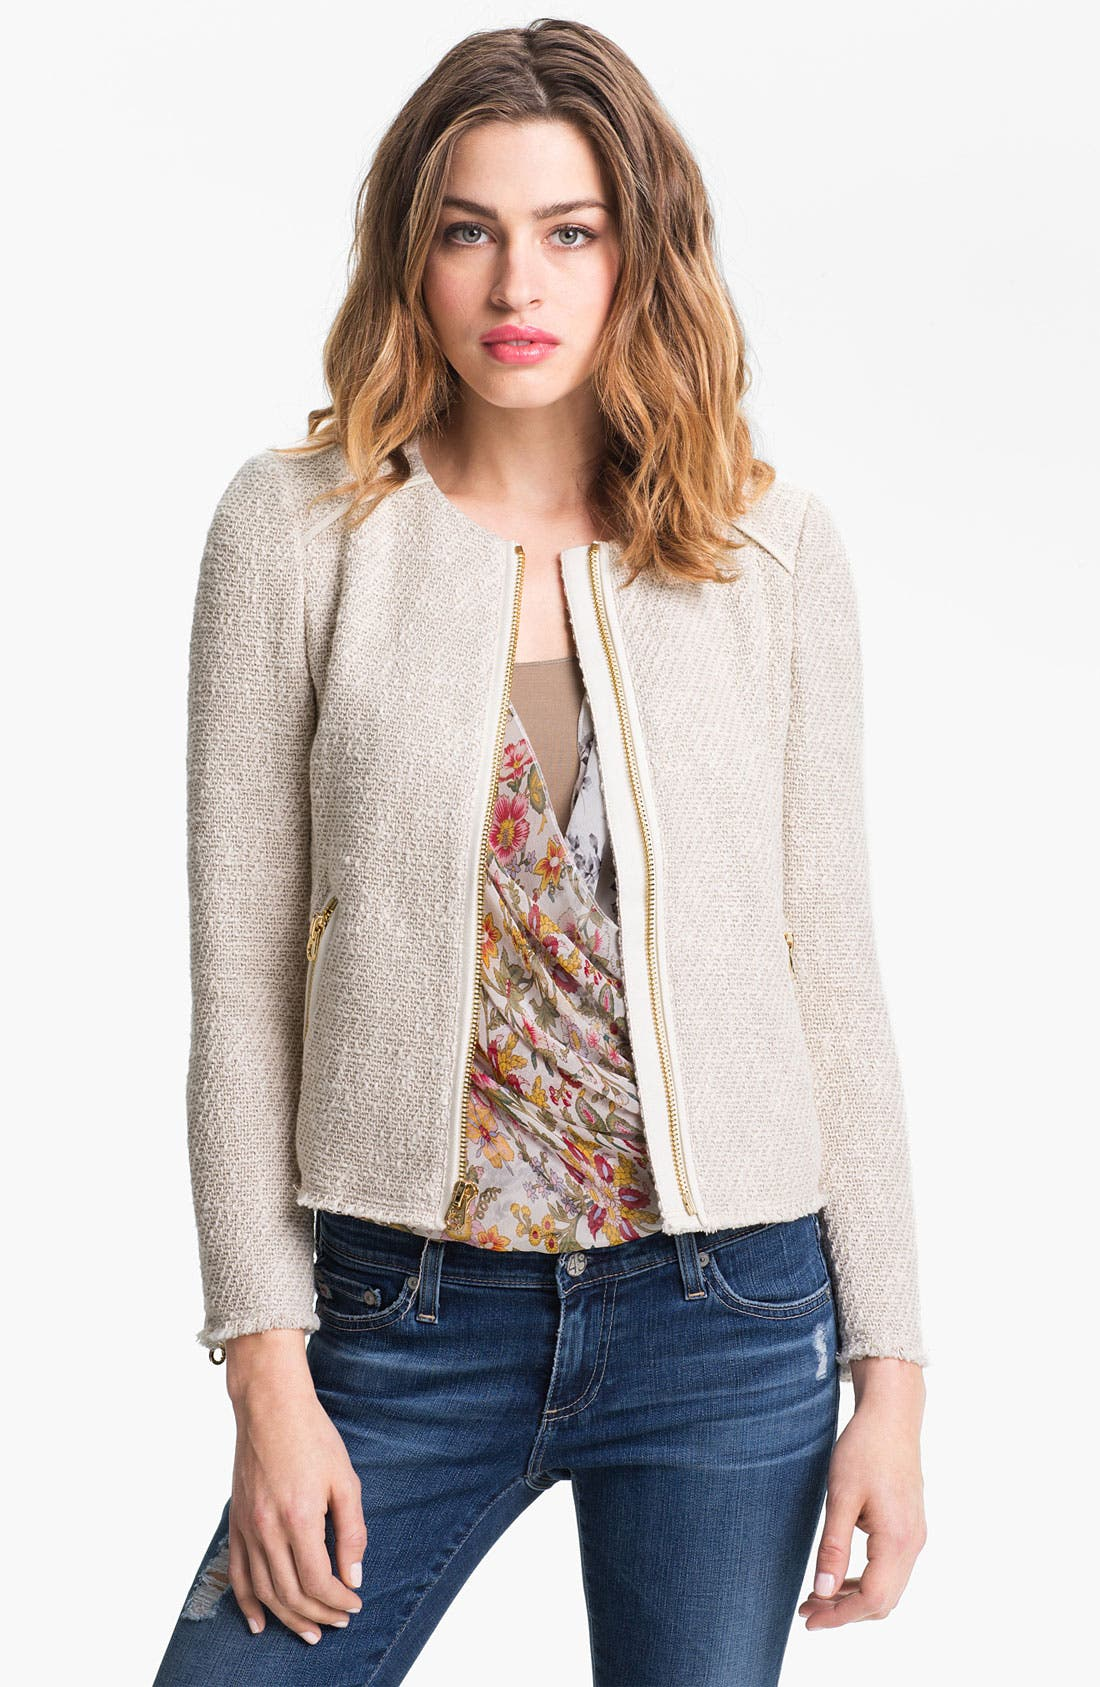 Alternate Image 1 Selected - Juicy Couture Bouclé Jacket